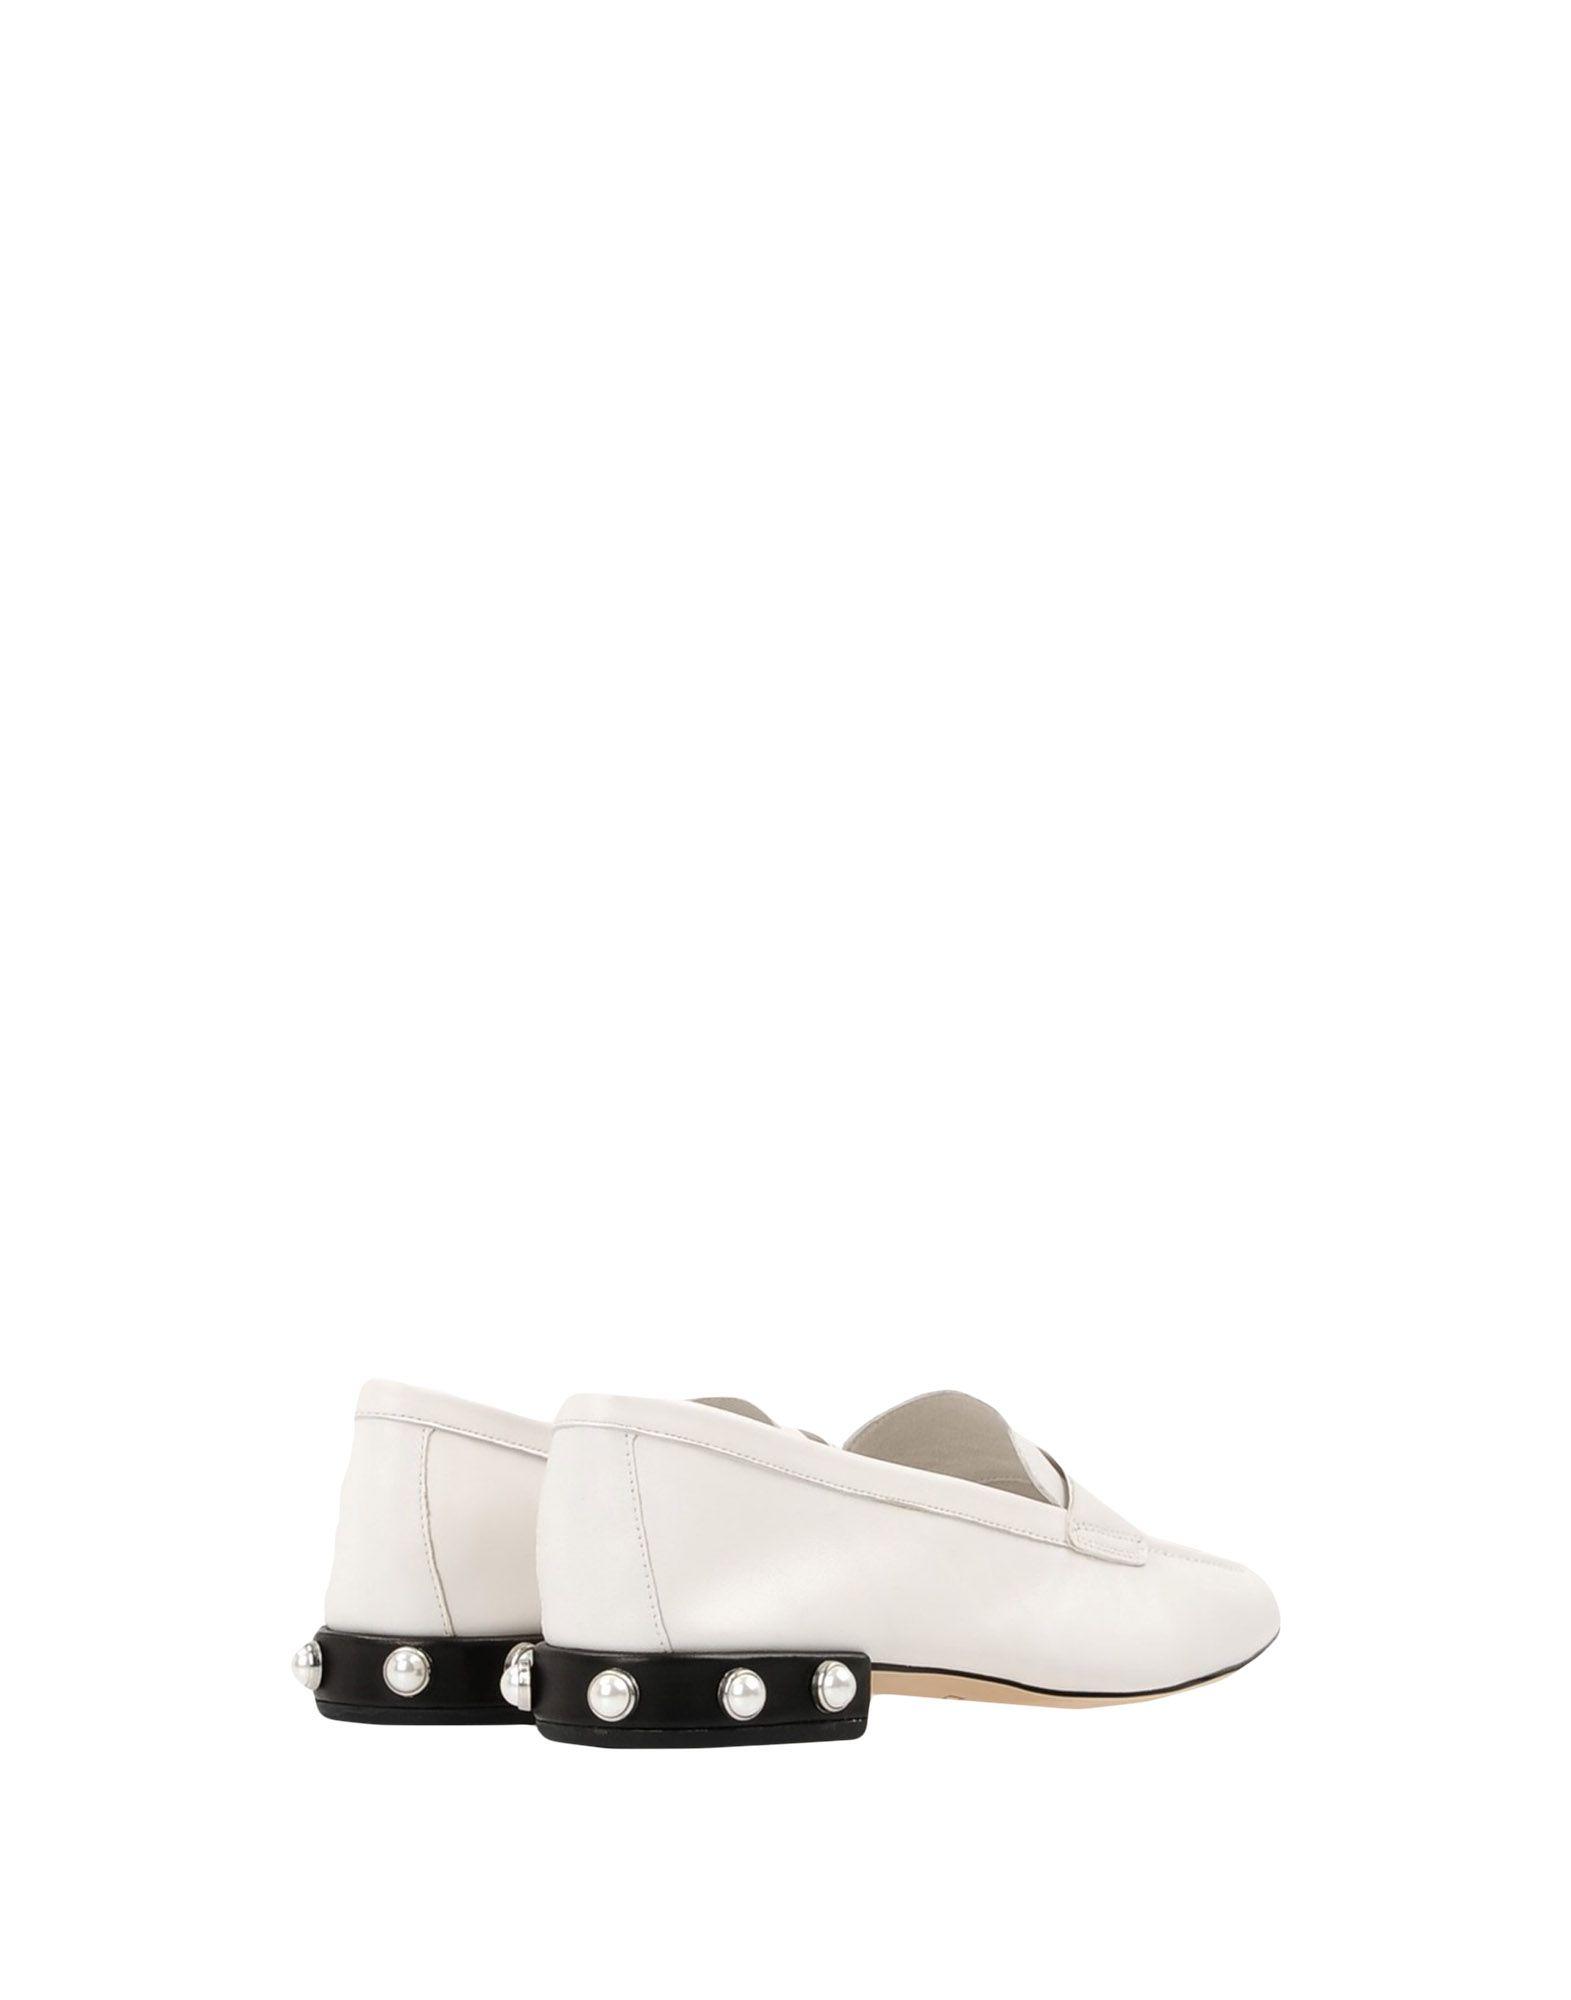 dkny femmes & # 39; s Chaussure  - mocassins mocassins - femmes dkny 11413642so mocassins mocassins en ligne le royaume - uni - 89727e